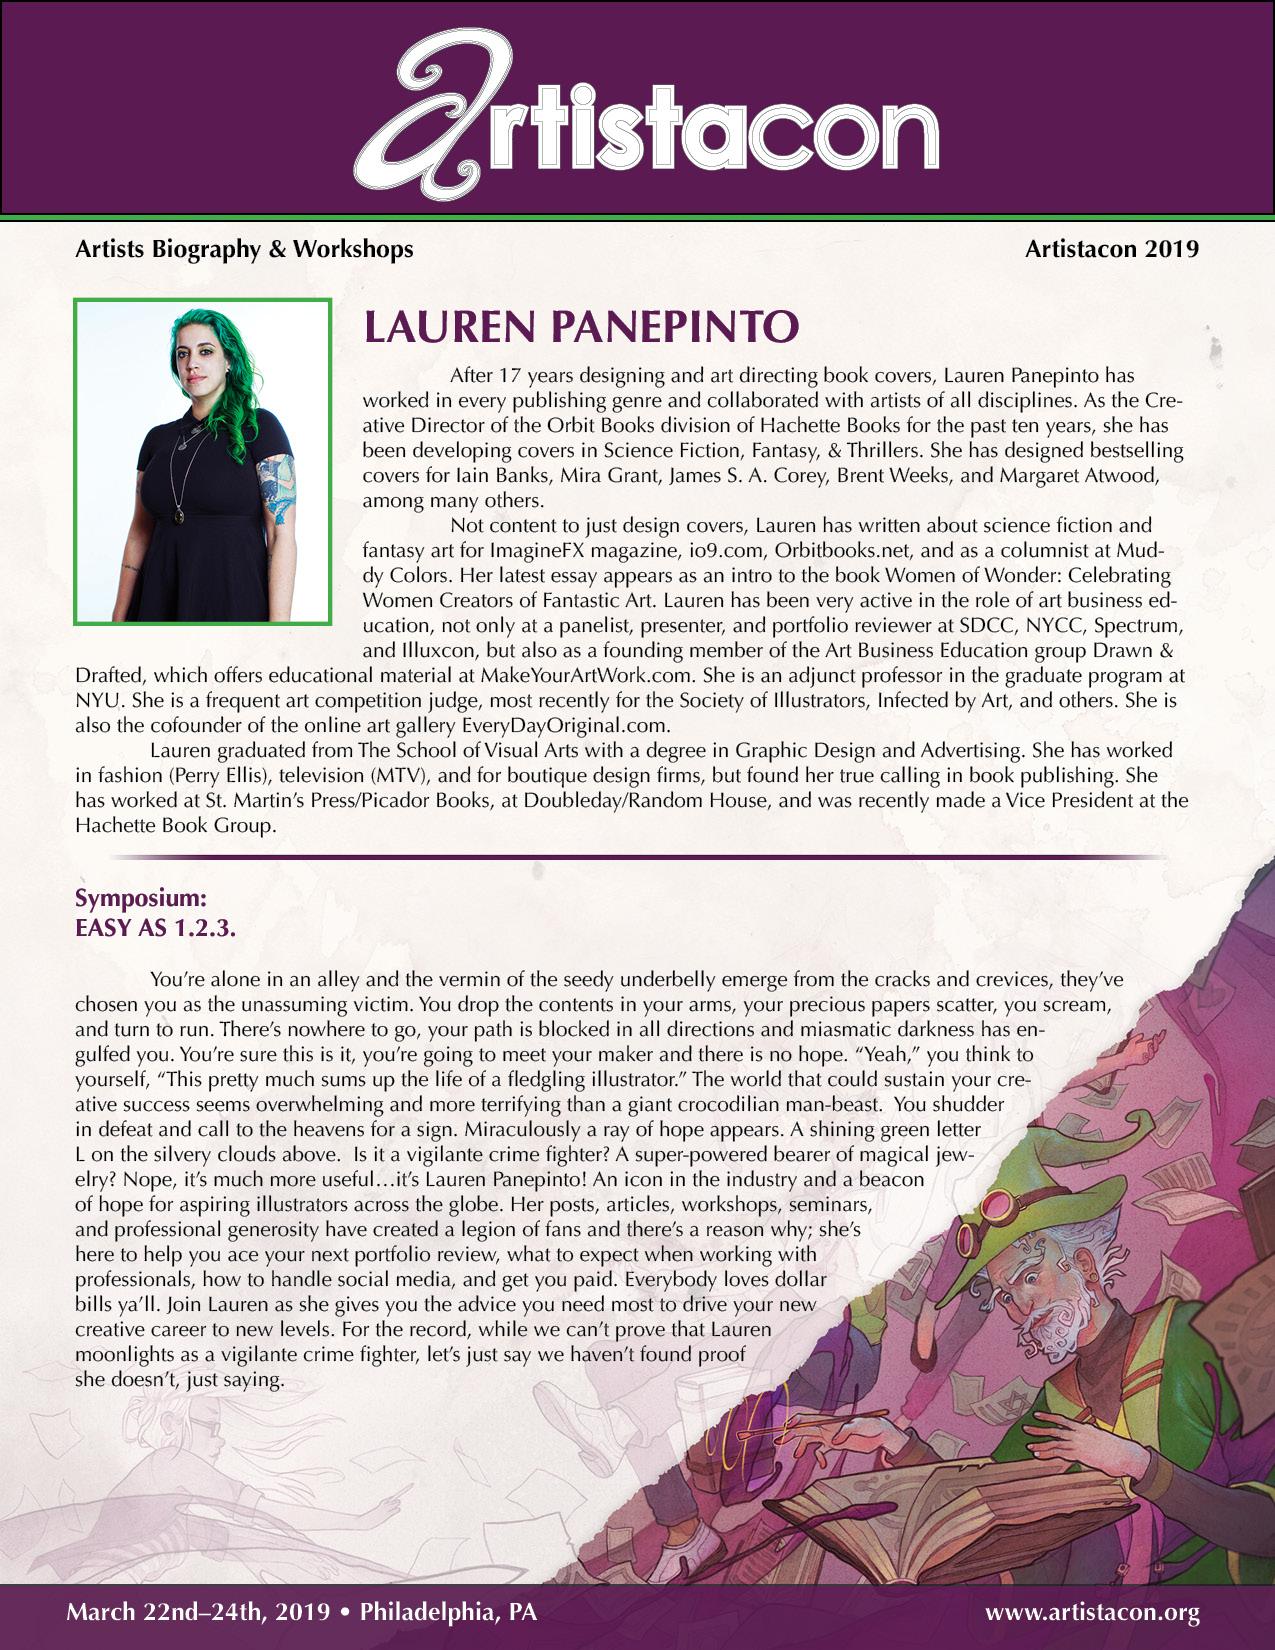 bioPage_Template_Artistacon2019_Panepinto_002.jpg